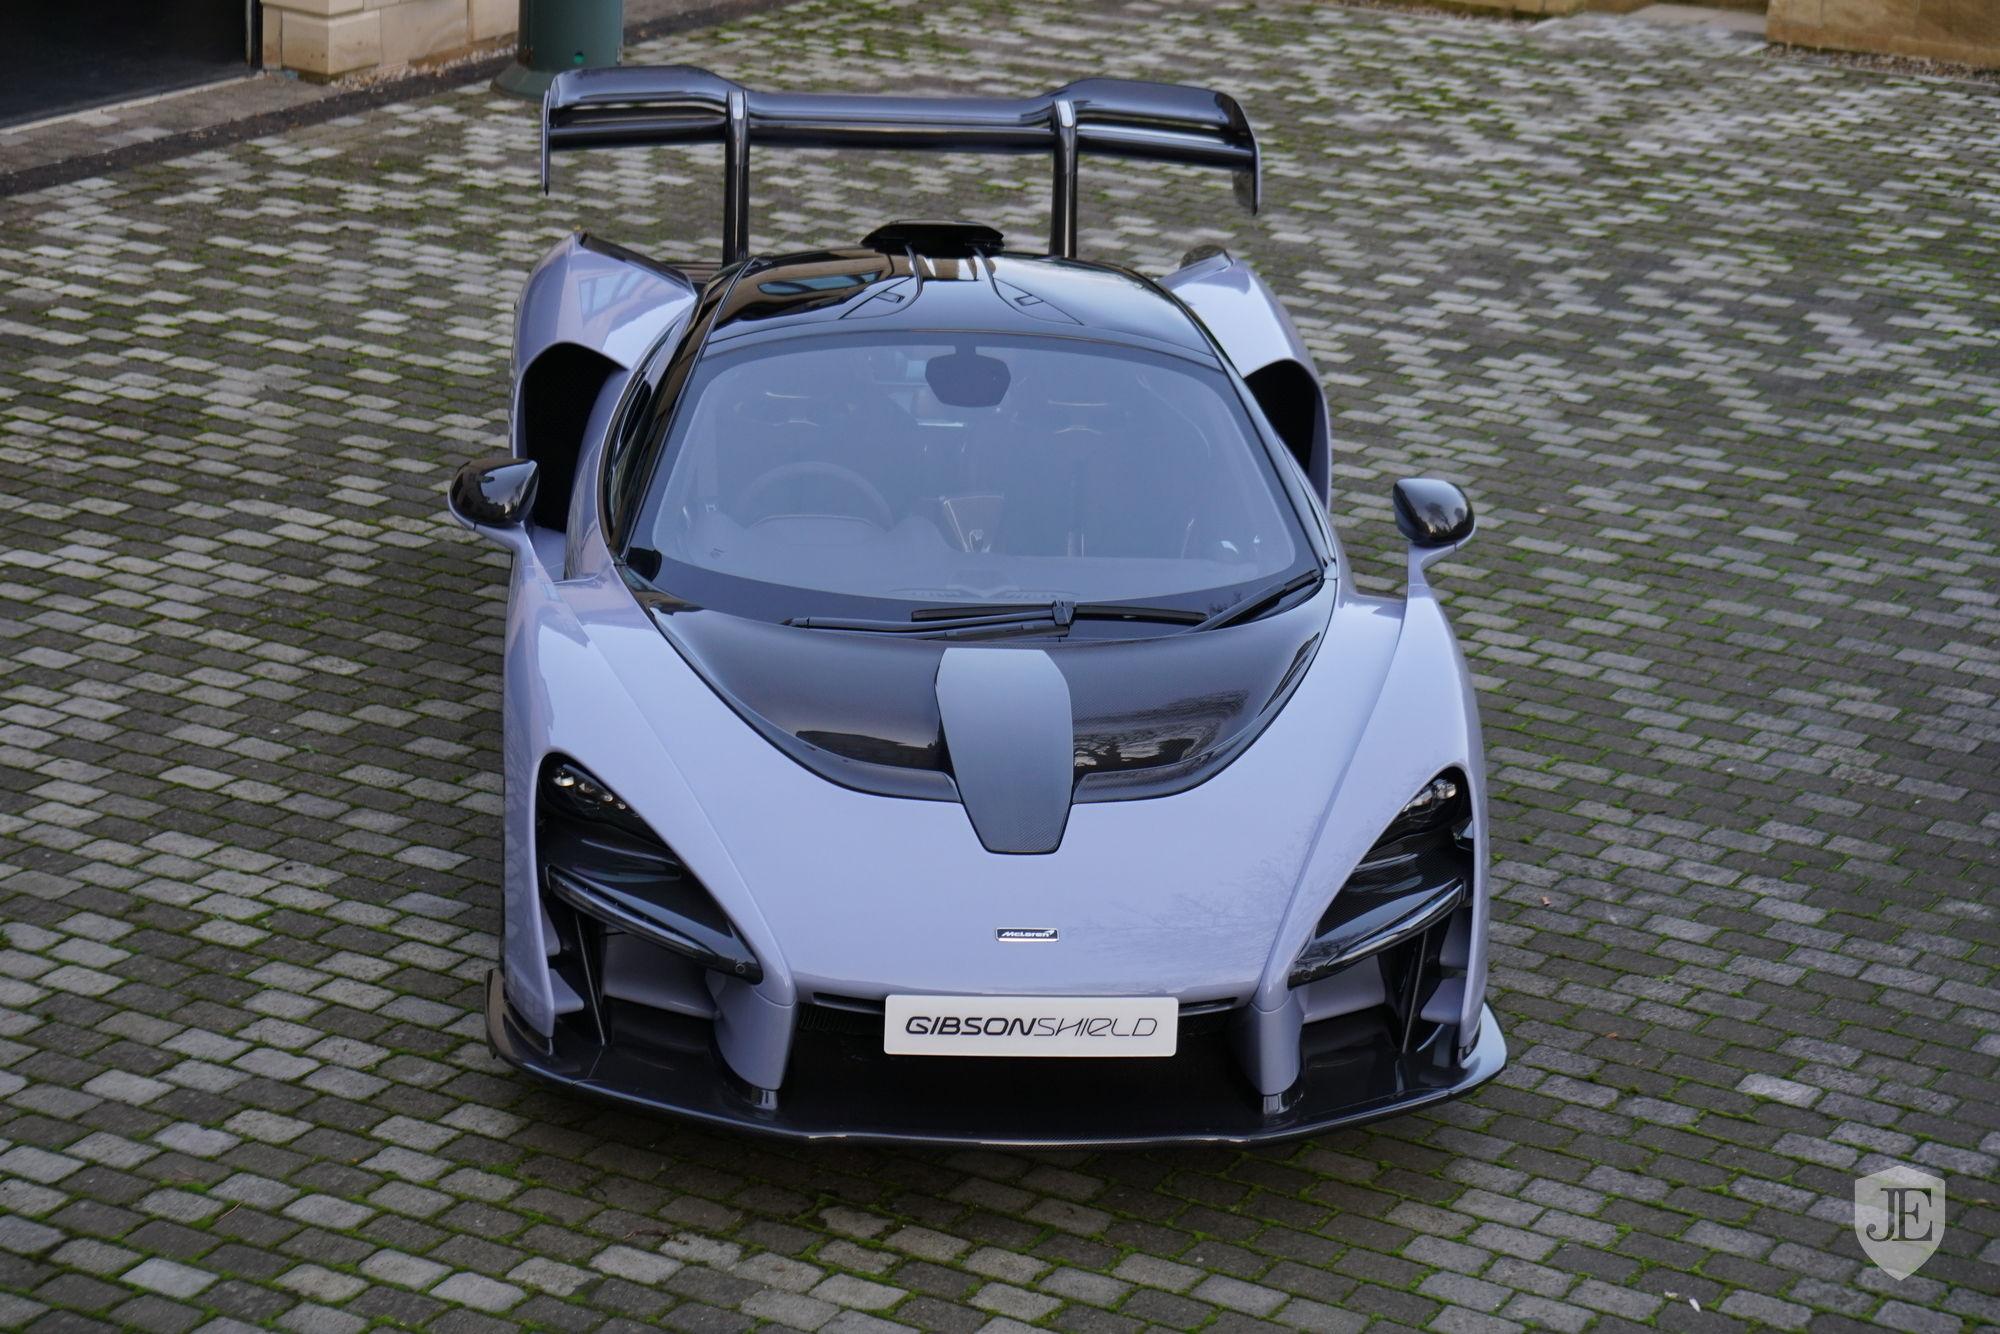 McLaren_Senna_for_sale_0018